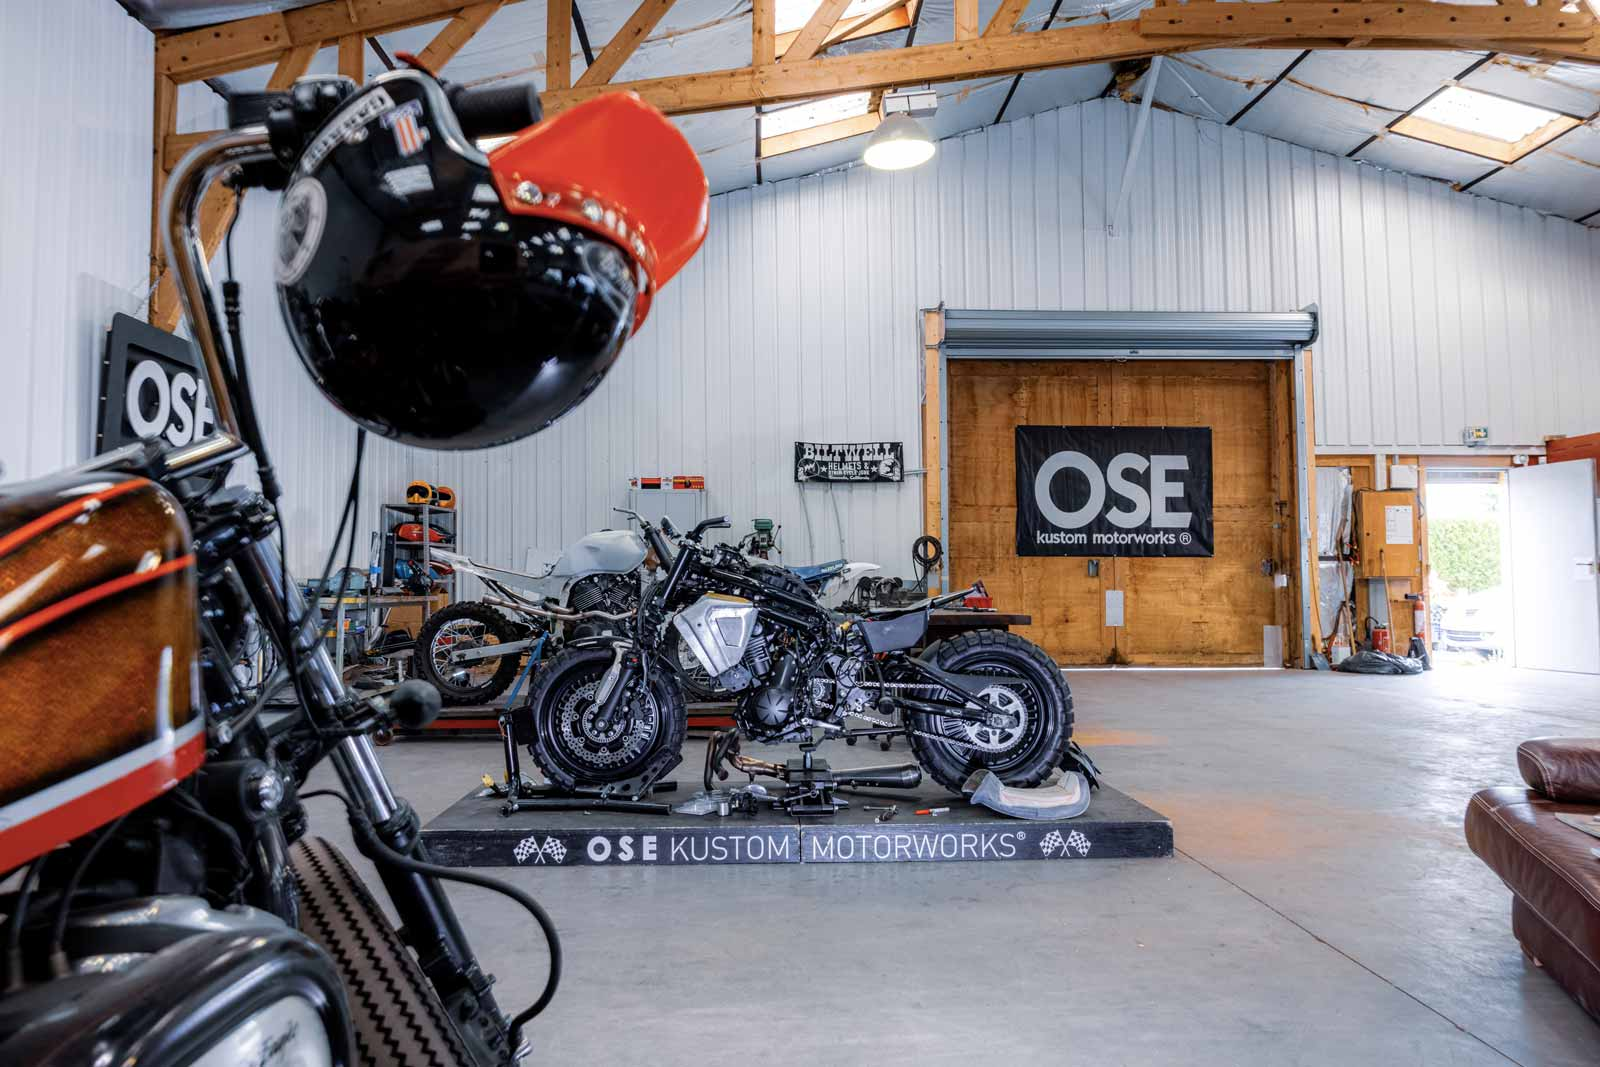 OSE Kustom Motorworks